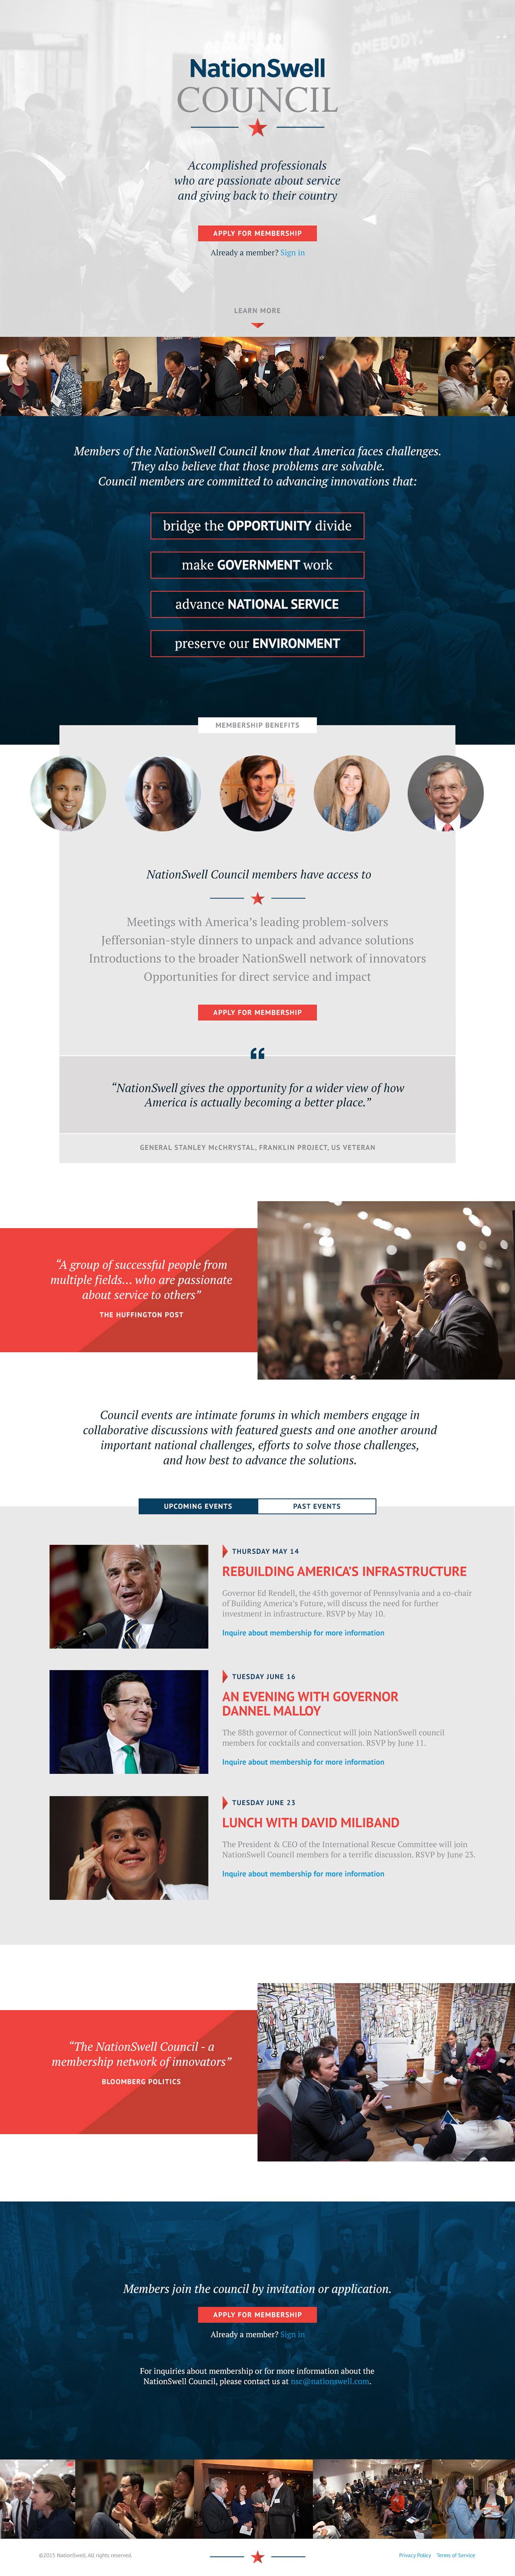 NationSwell Council Portal Website Screenshot